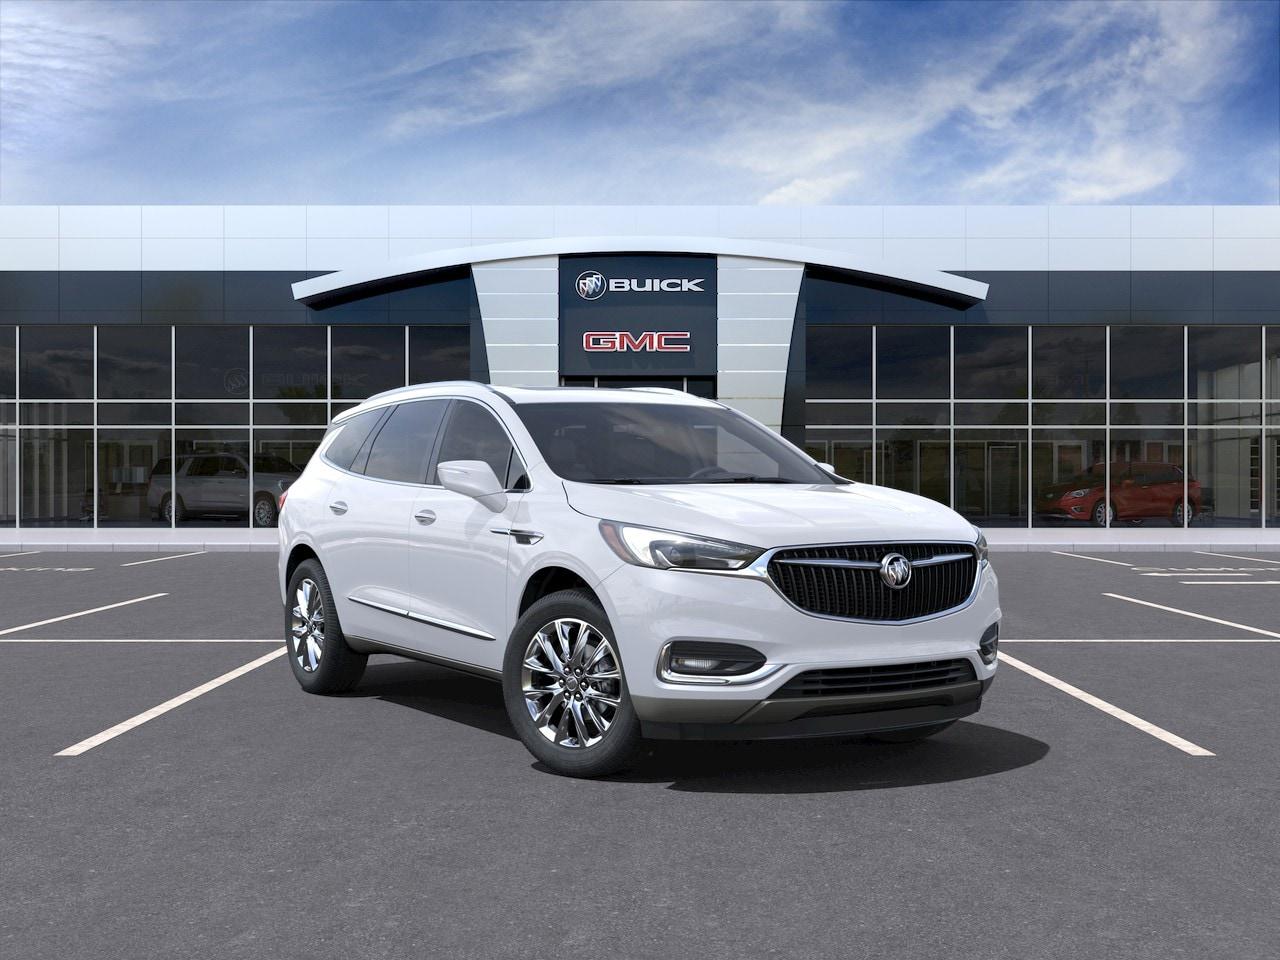 2021 Buick Enclave Triadelphia WV